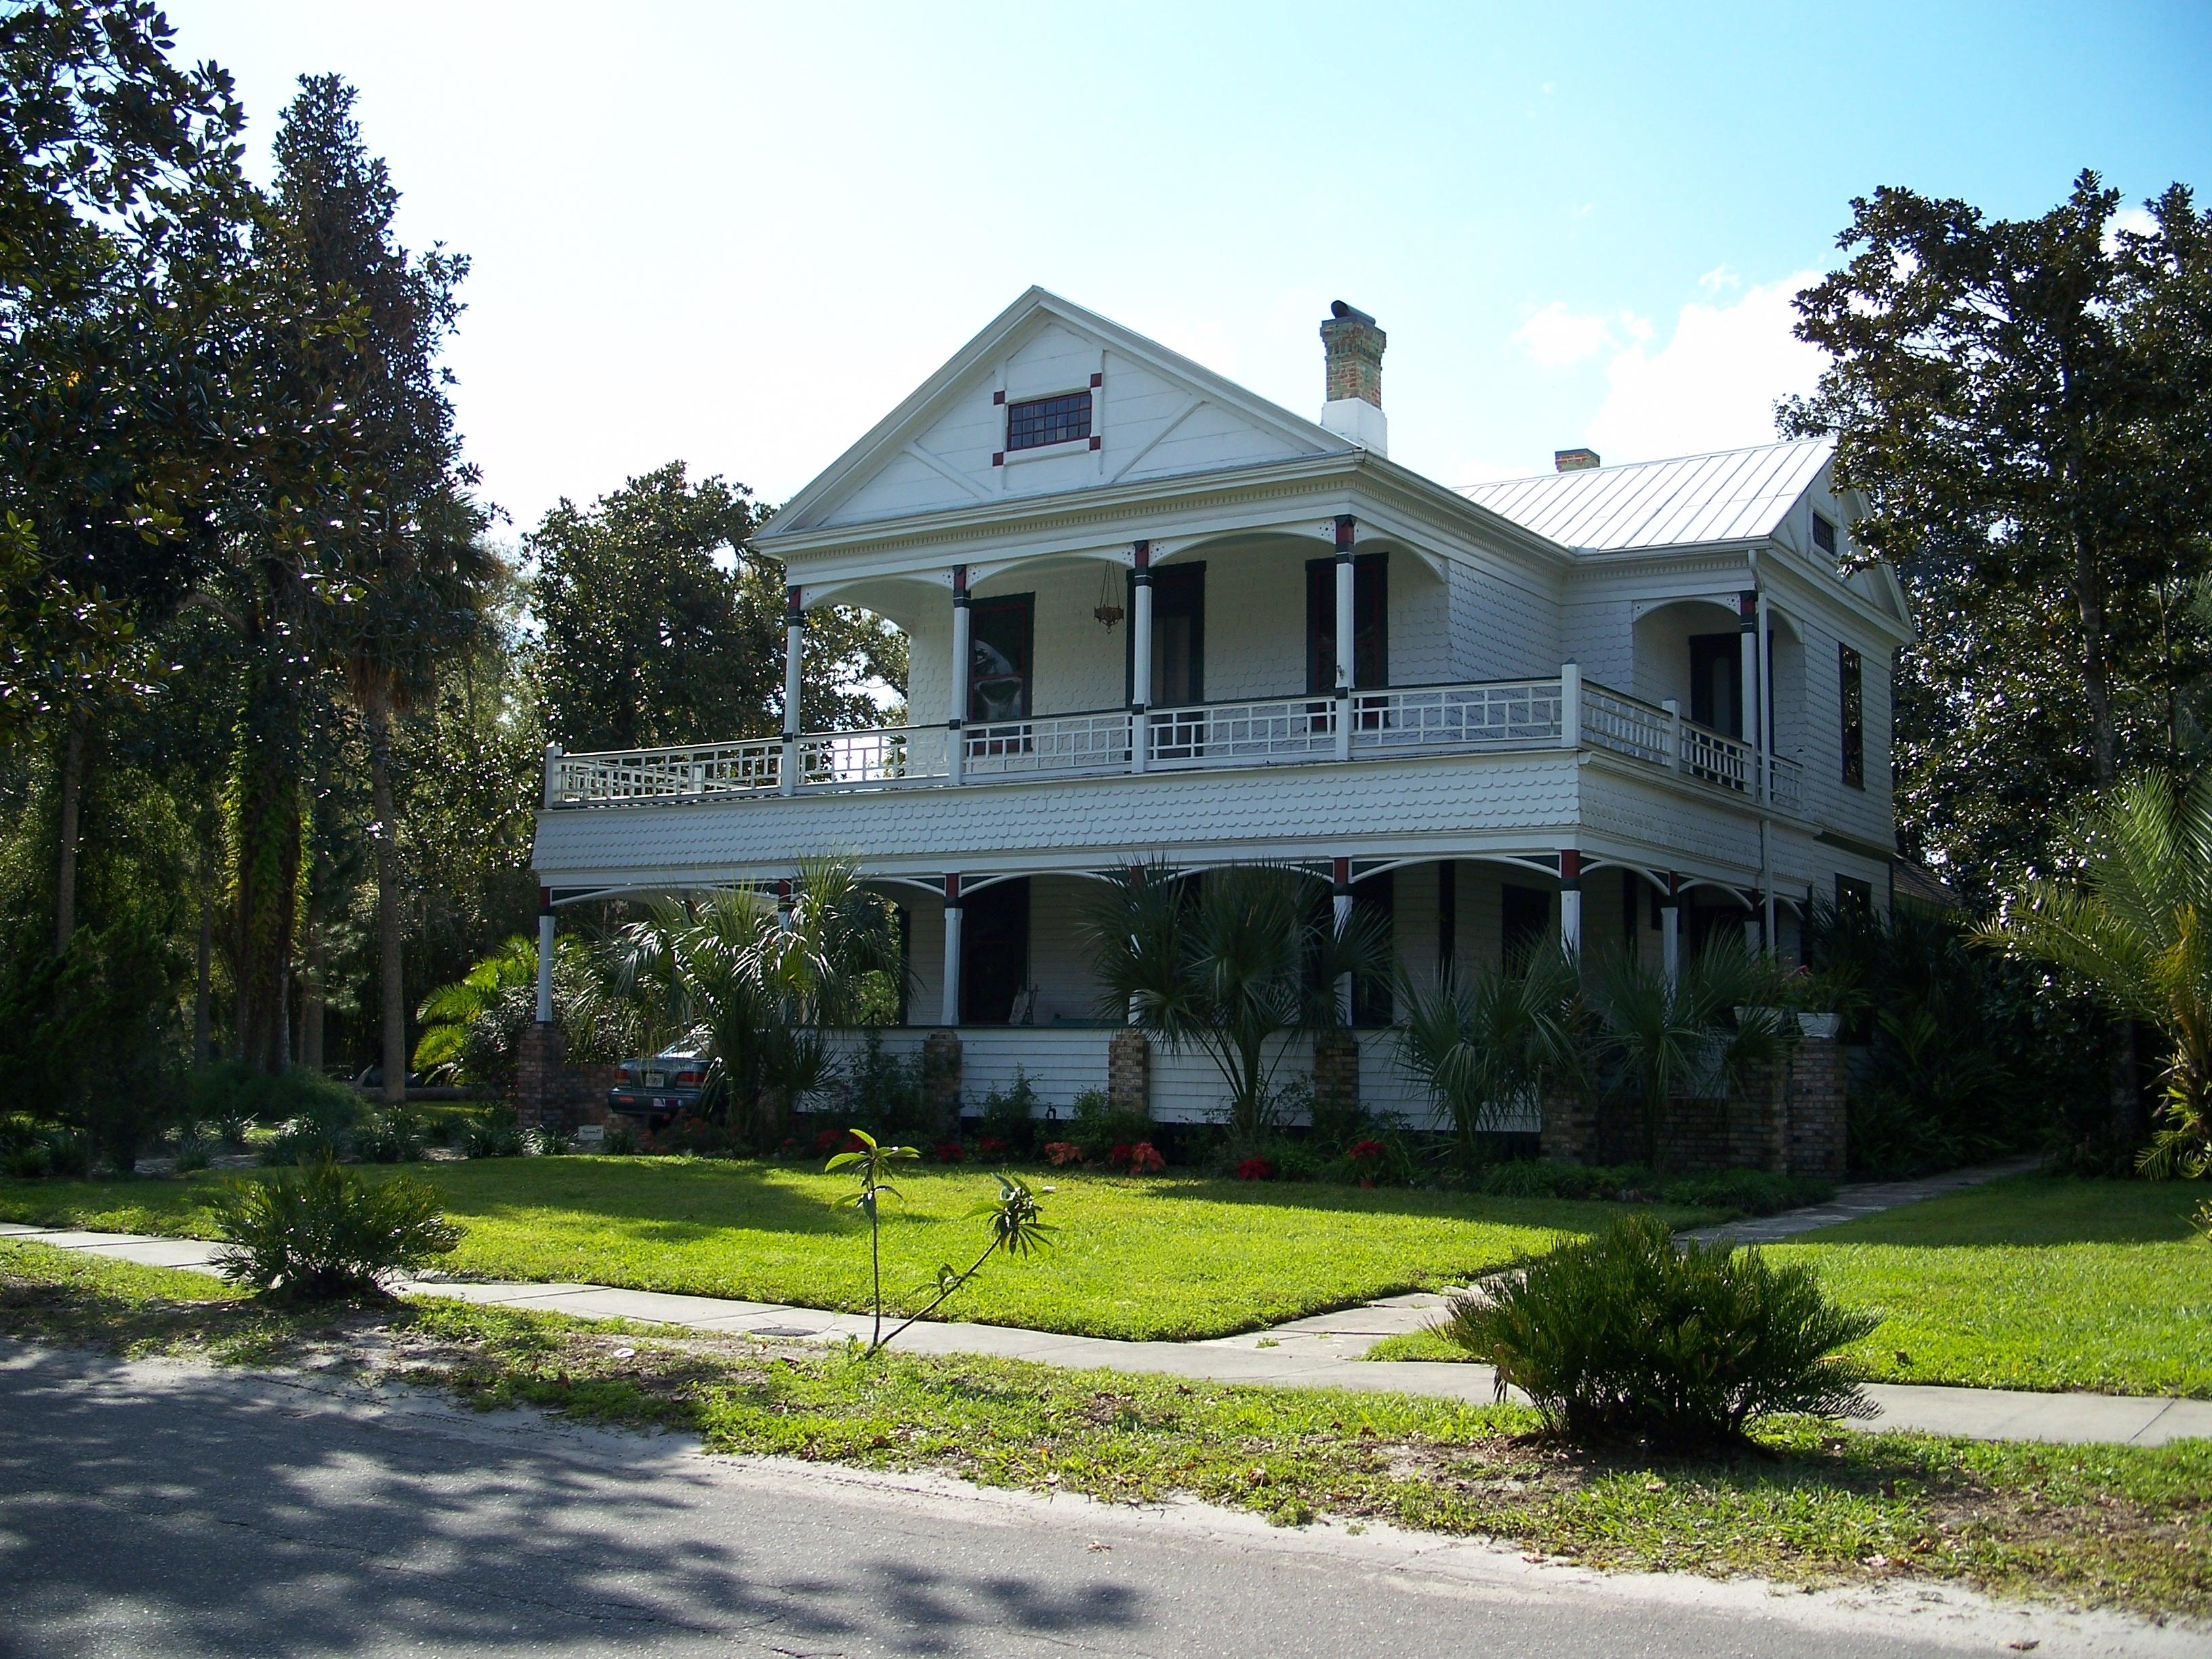 Florida Judgment Lien On Homestead Property